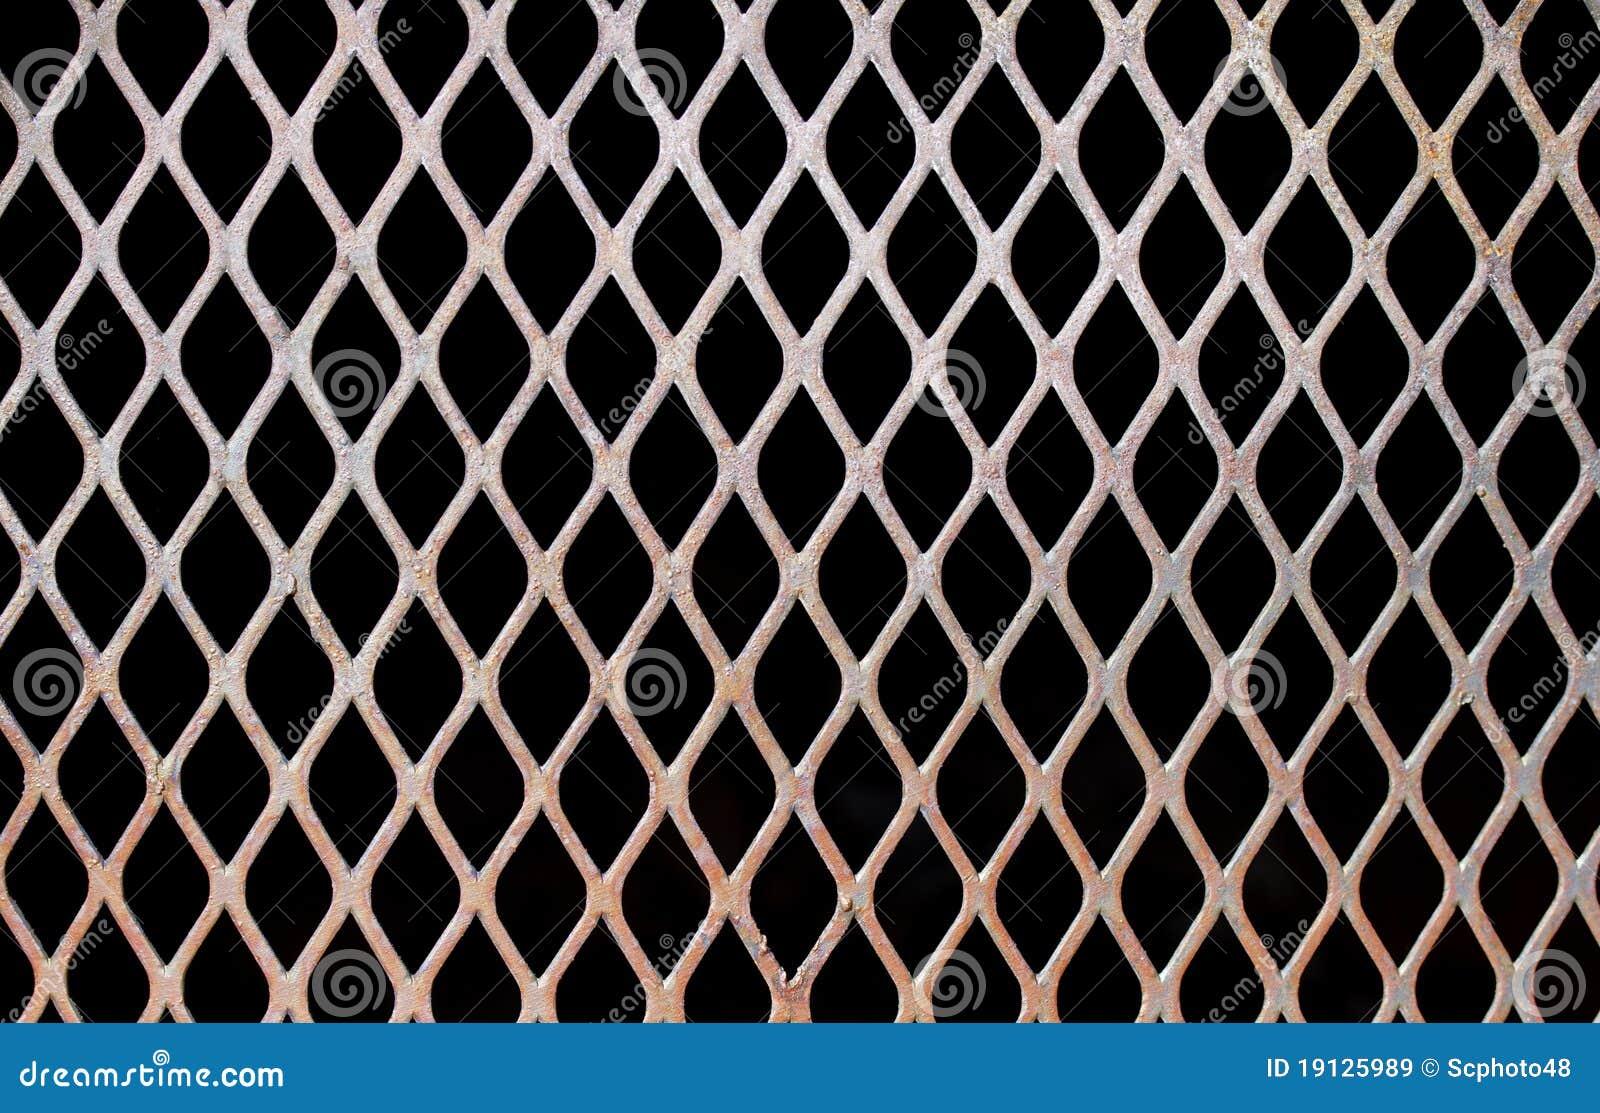 rusty steel mesh stock image  image of fence  barrier